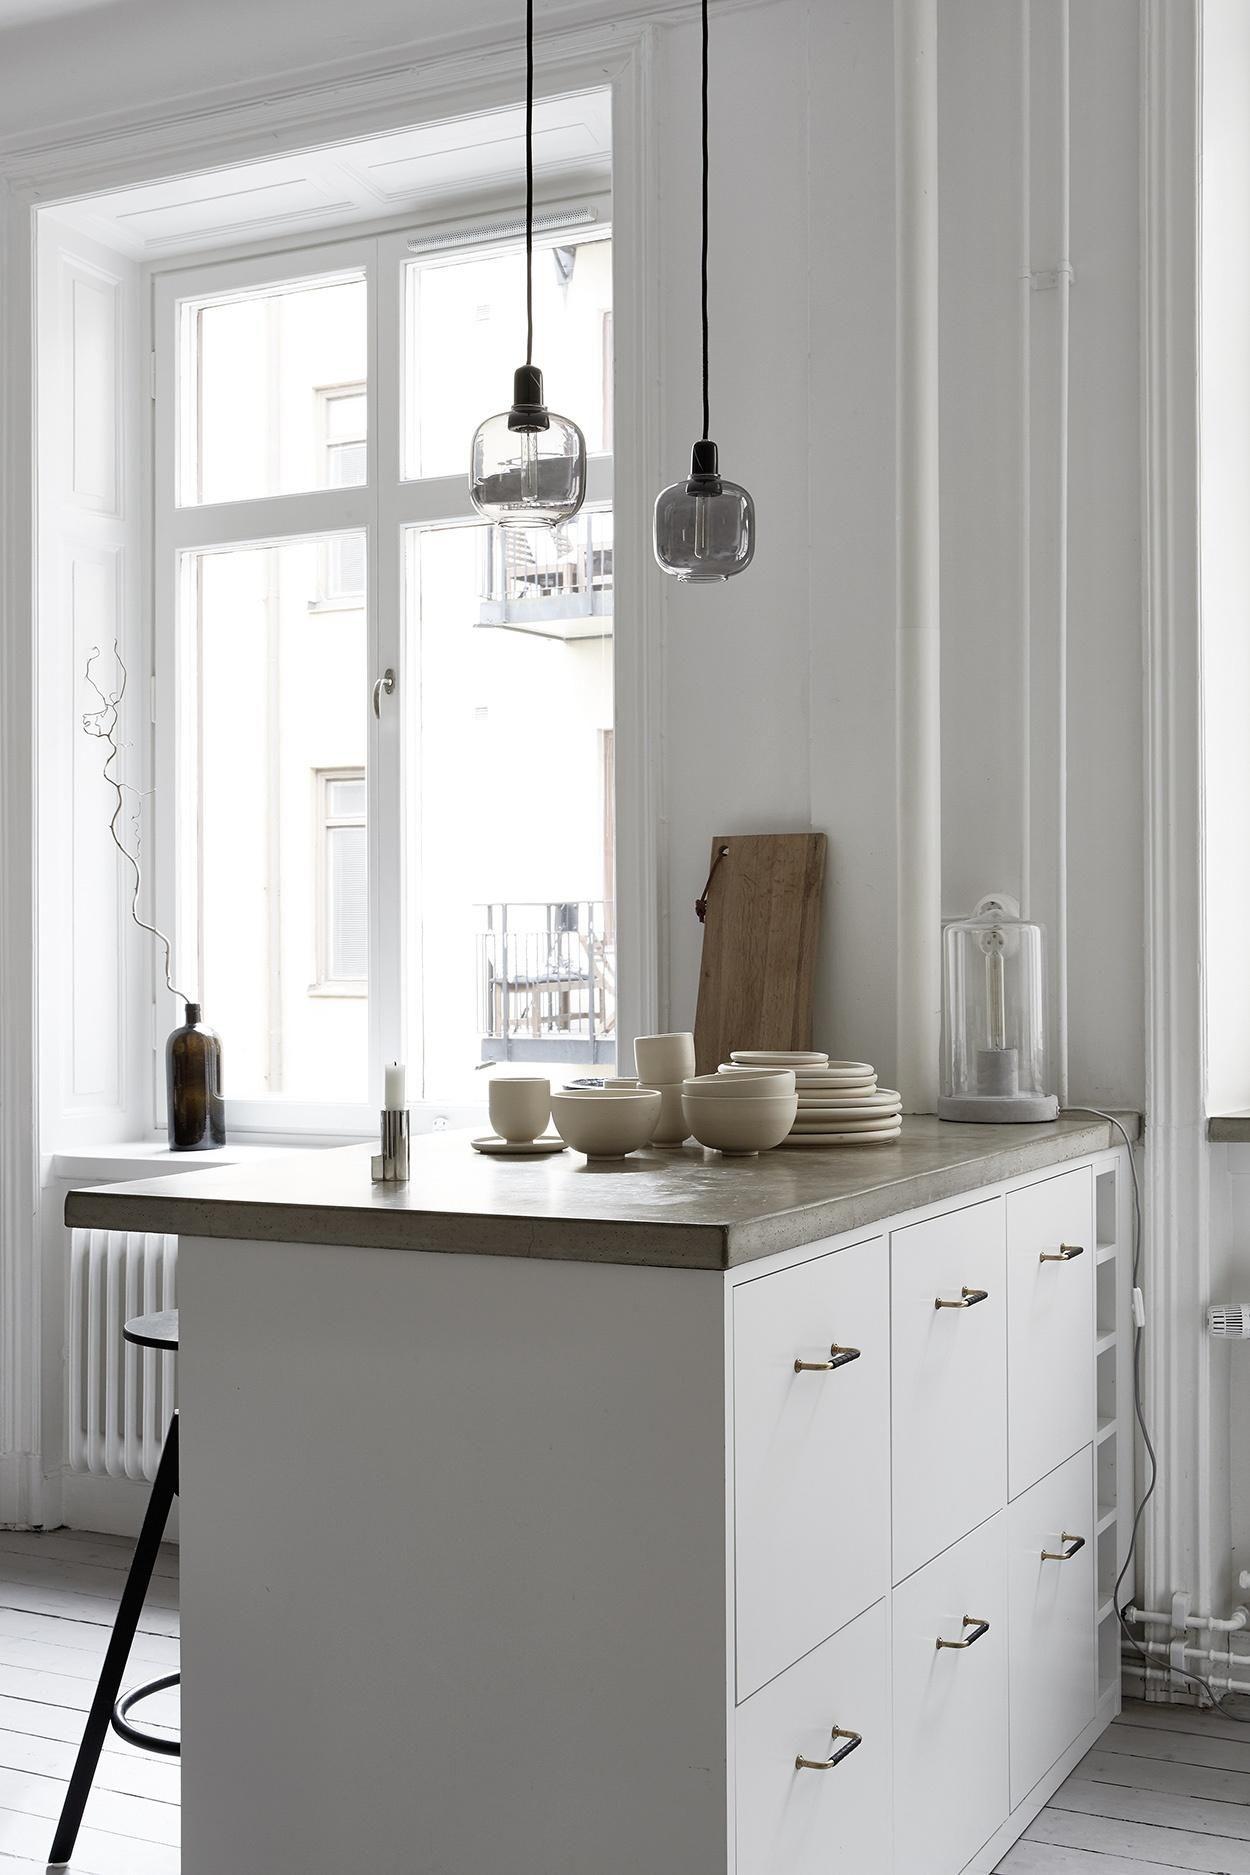 Stylish Home In Natural Colors Via Coco Lapine Design Blog Juliaalena Minimalist Kitchen Design Kitchen Interior Minimalist Kitchen